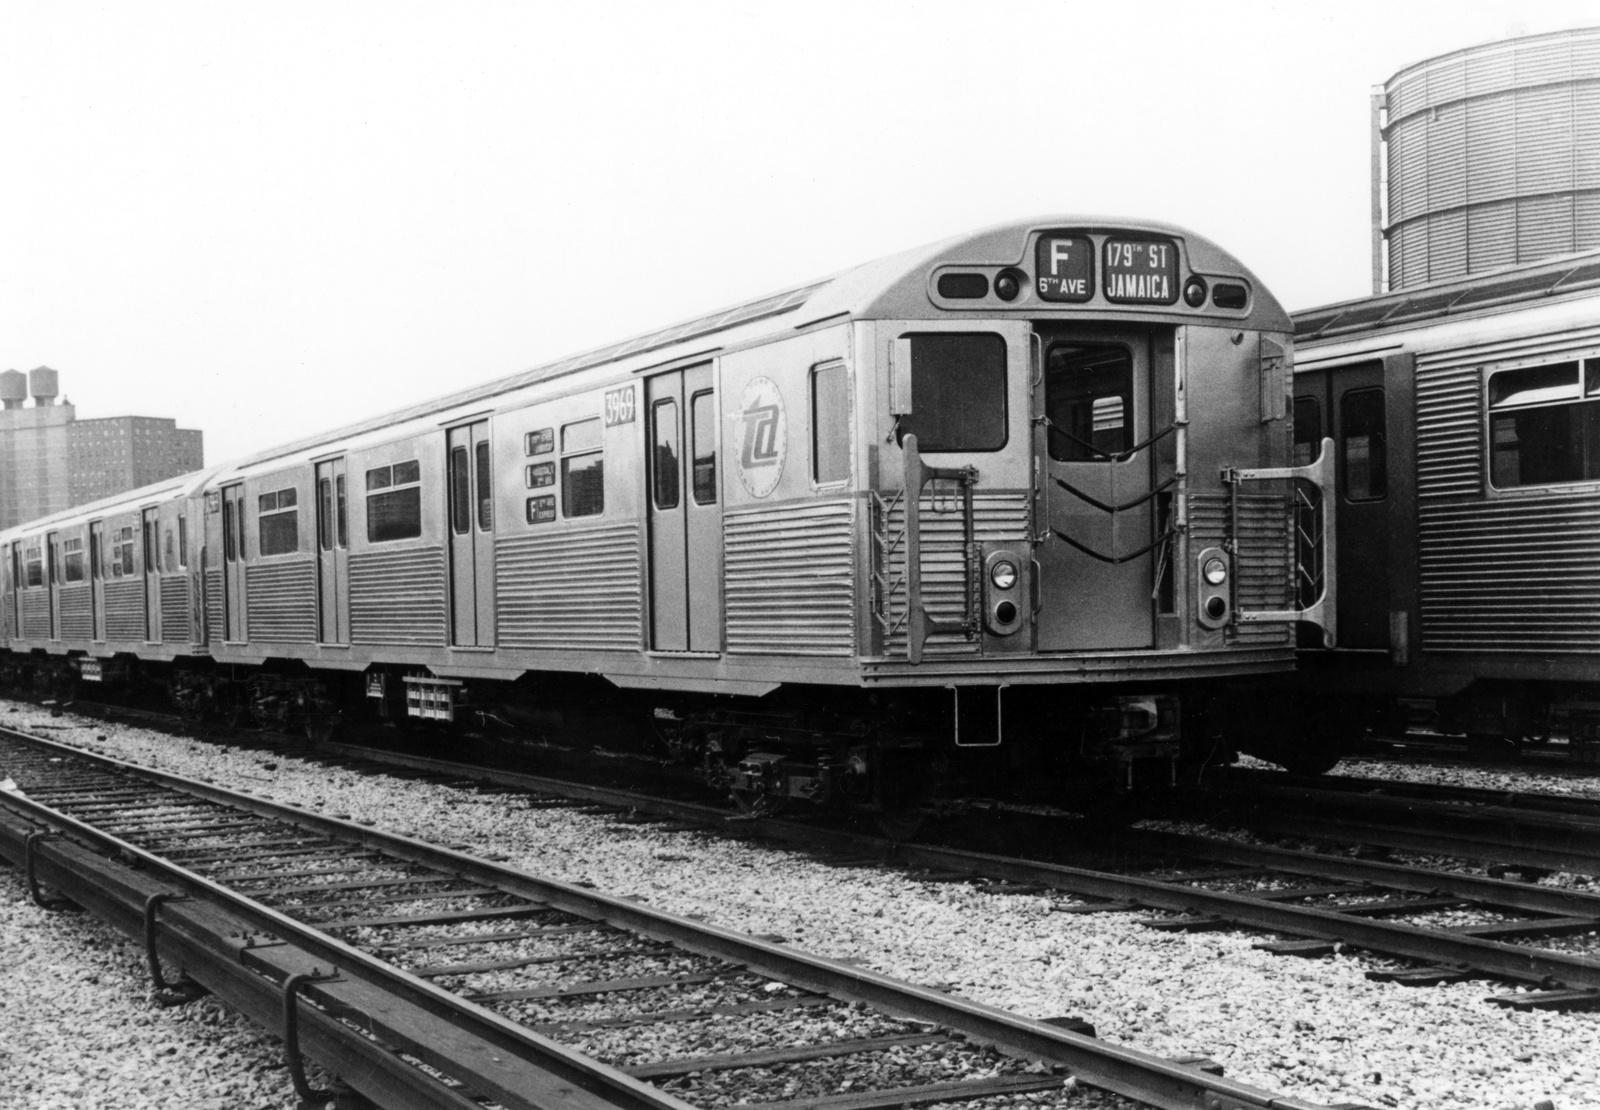 (273k, 1024x812)<br><b>Country:</b> United States<br><b>City:</b> New York<br><b>System:</b> New York City Transit<br><b>Location:</b> Coney Island Yard<br><b>Car:</b> R-38 (St. Louis, 1966-1967)  3969 <br><b>Photo by:</b> Ed Watson/Arthur Lonto Collection<br><b>Collection of:</b> Frank Pfuhler<br><b>Date:</b> 1966<br><b>Viewed (this week/total):</b> 3 / 848